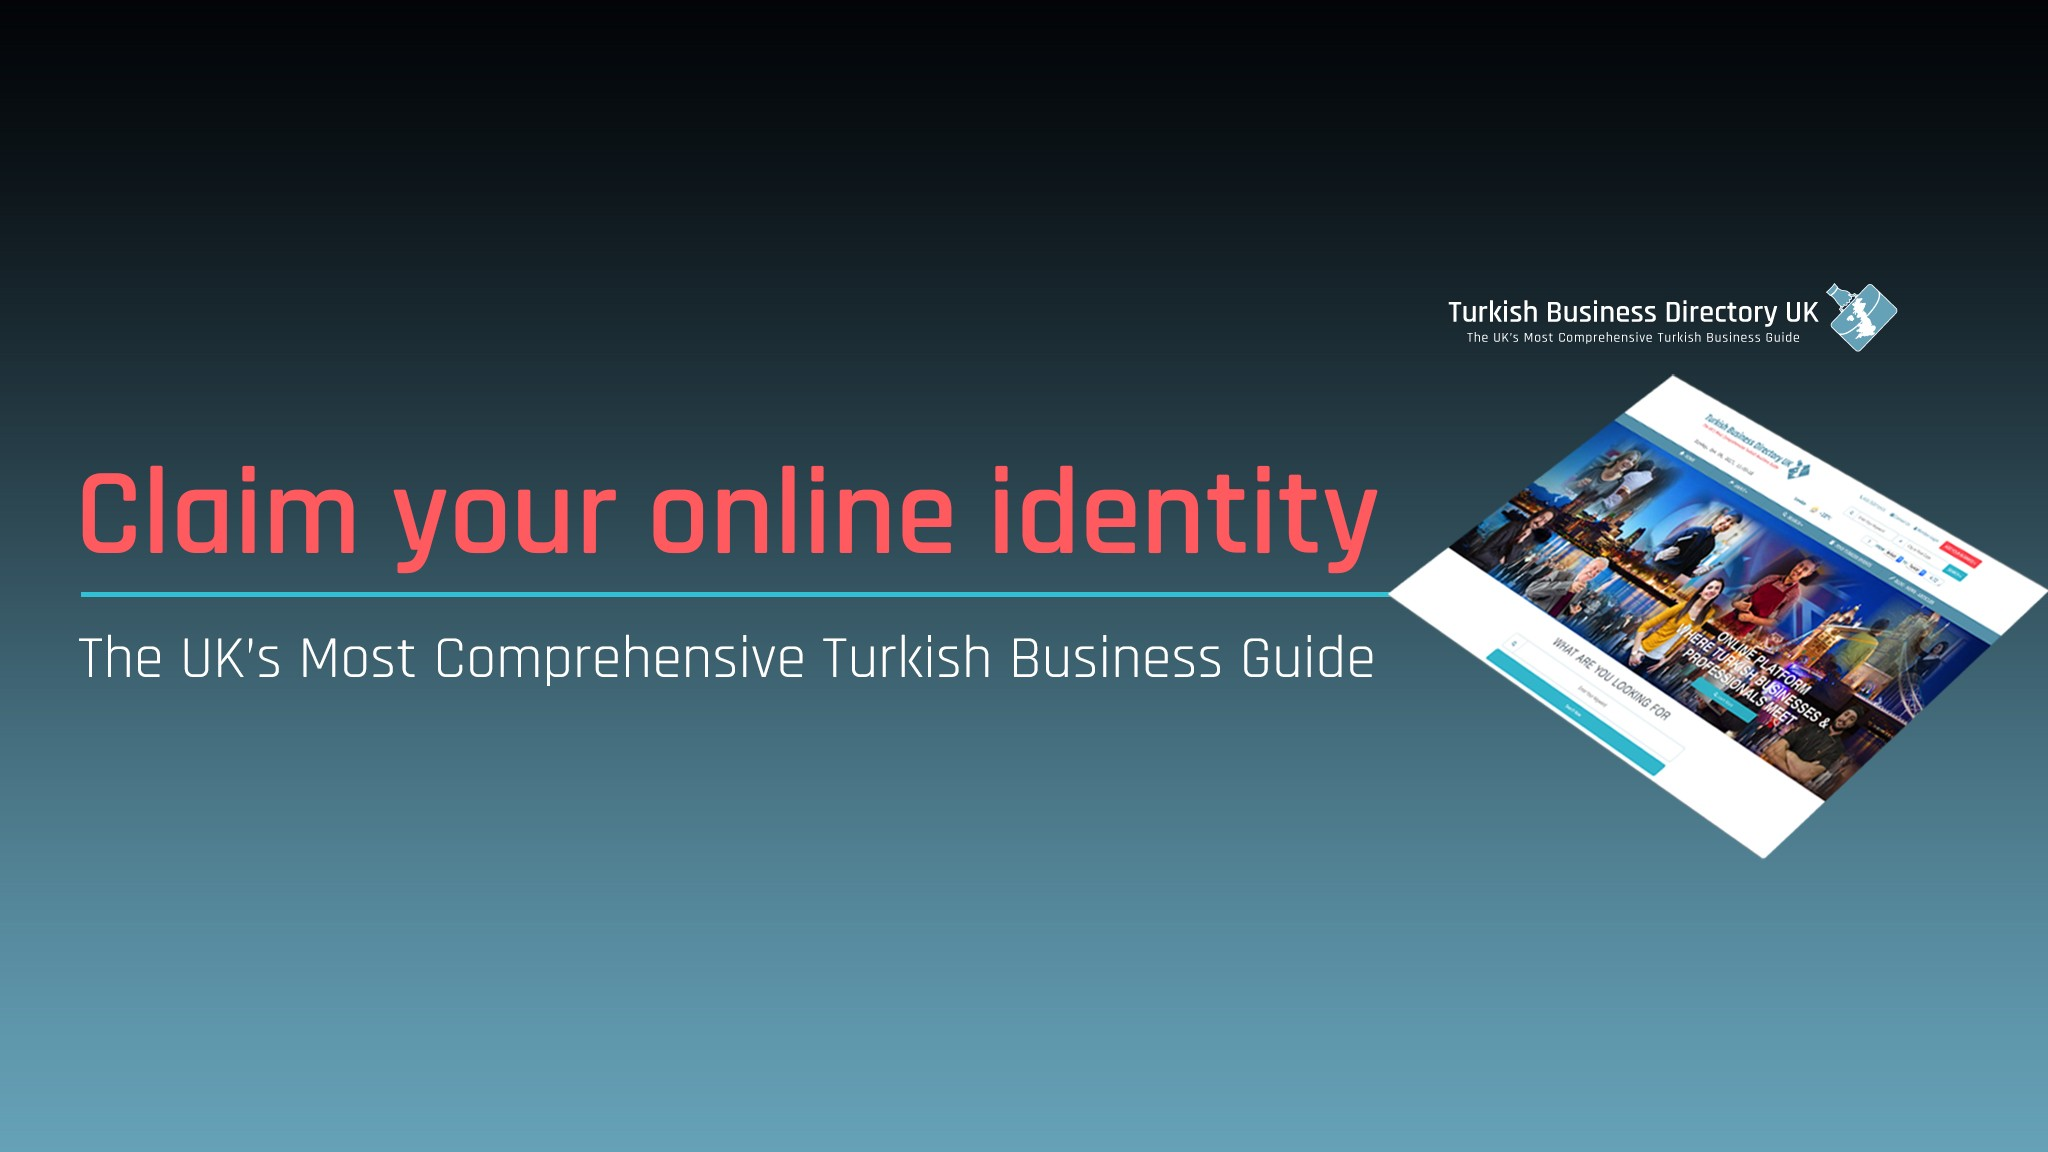 Turkish Business Directory UK | LinkedIn